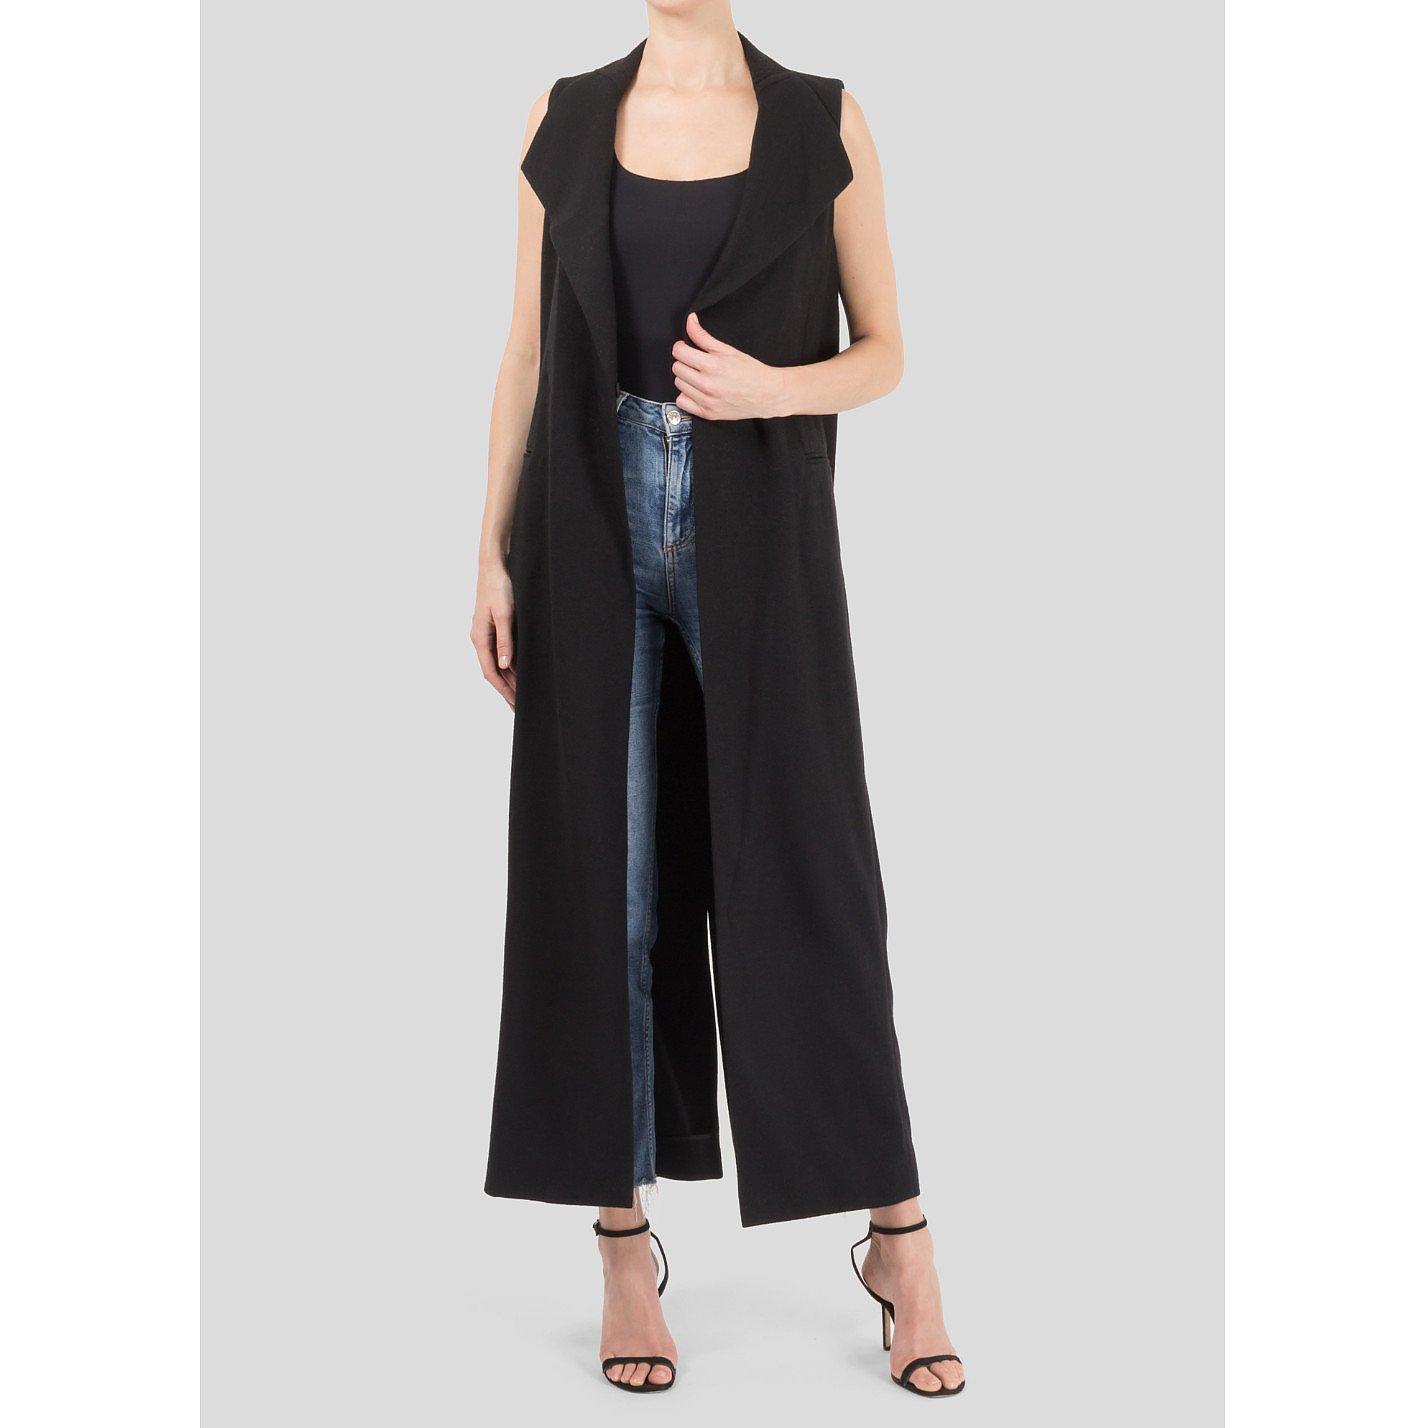 Amanda Wakeley Tailored Sleeveless Coat